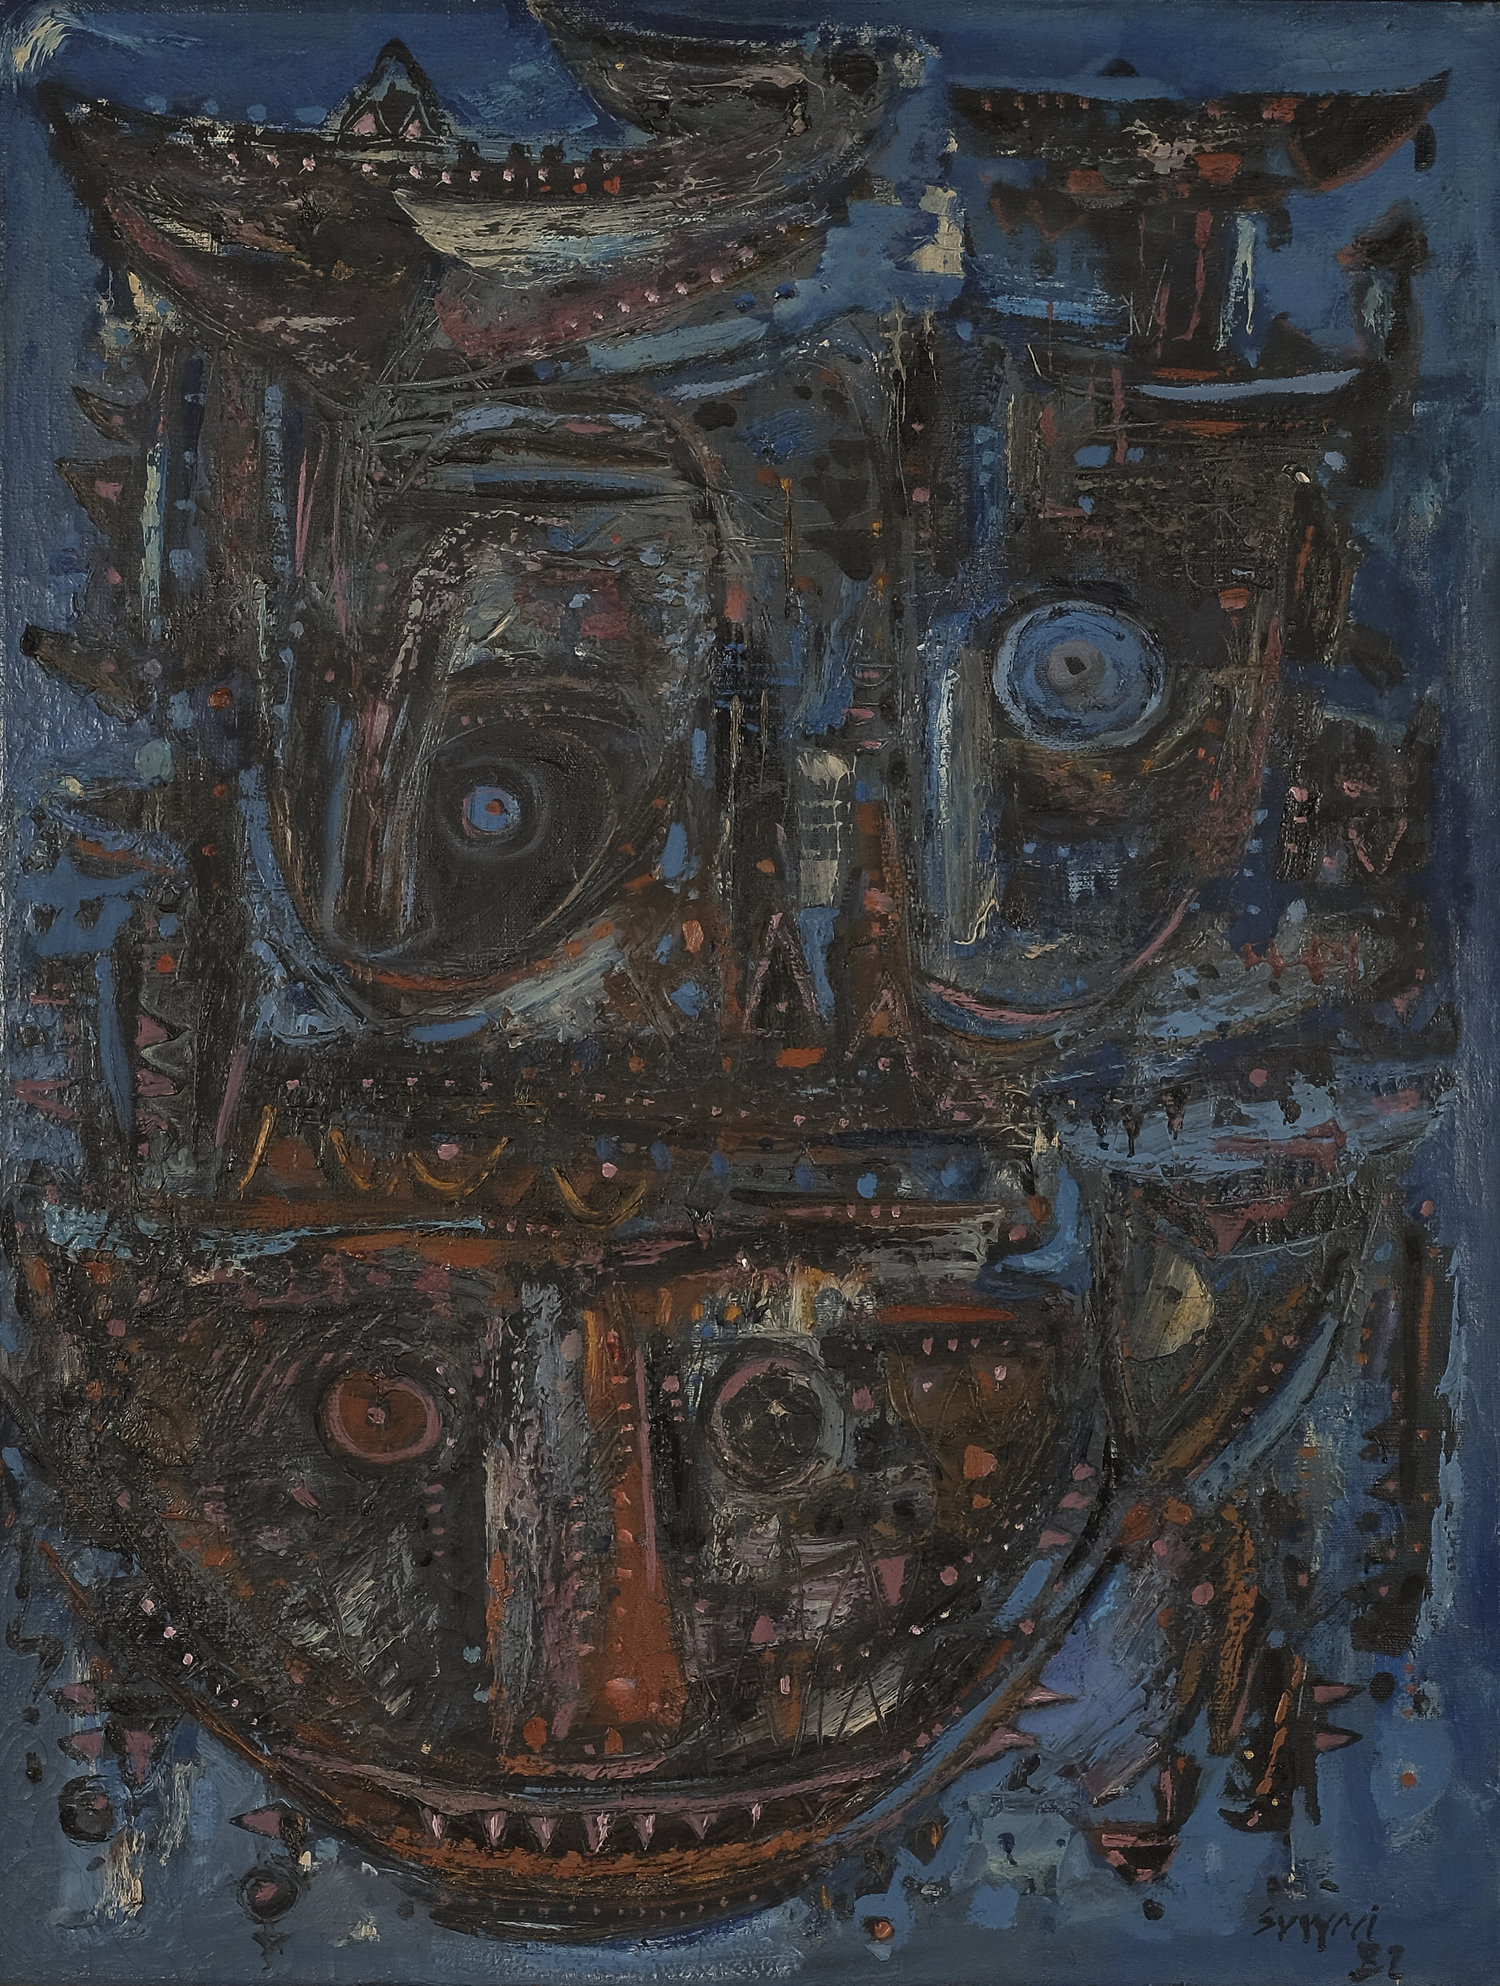 Suwaji, Topeng-Topeng Primitif (Primitive Mask), oil on canvas, 95 x 72 cm, 1981